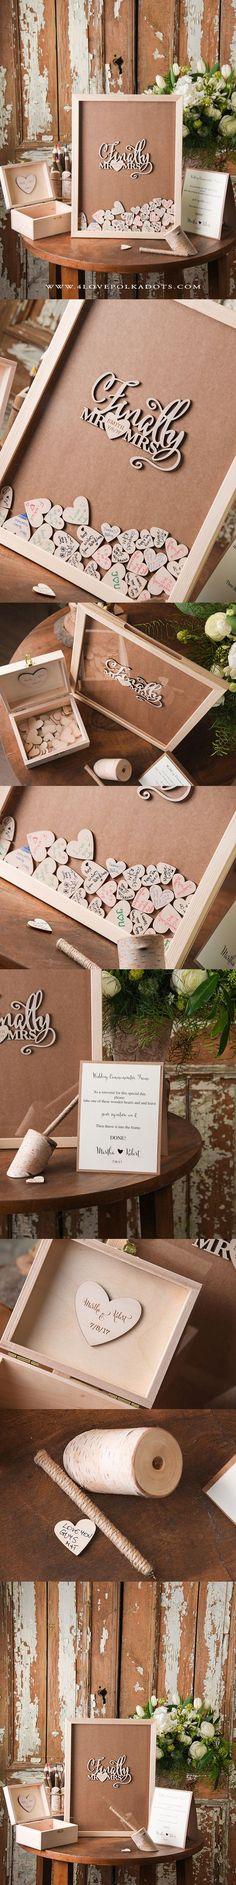 Finally Mr & Mrs ! Alternative Wedding Guest Book Frame  ||  4lovepokladots